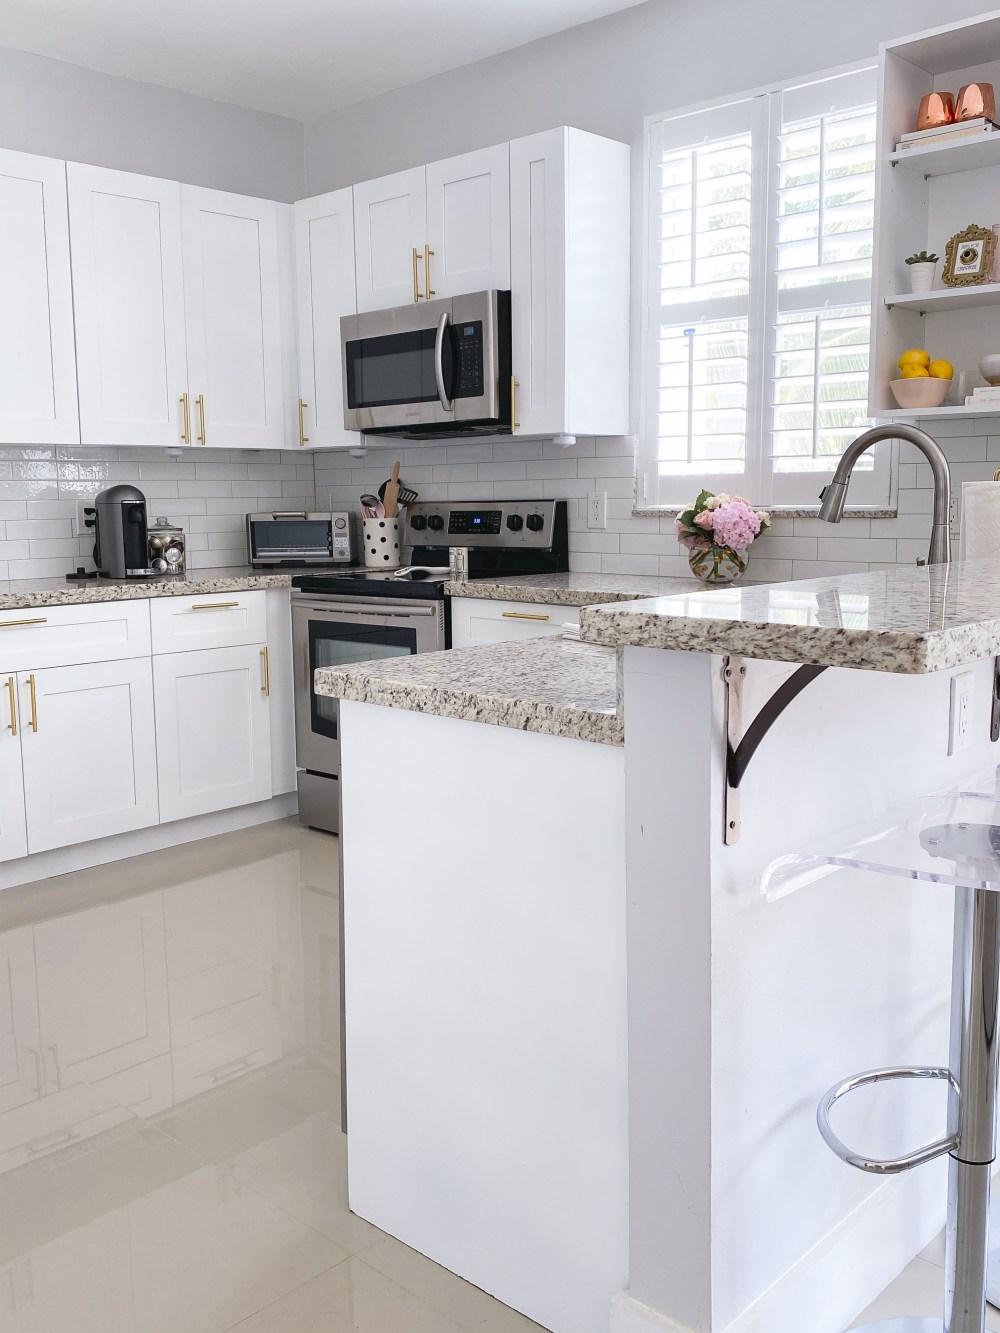 Fancy Things DIY Kitchen Remodel